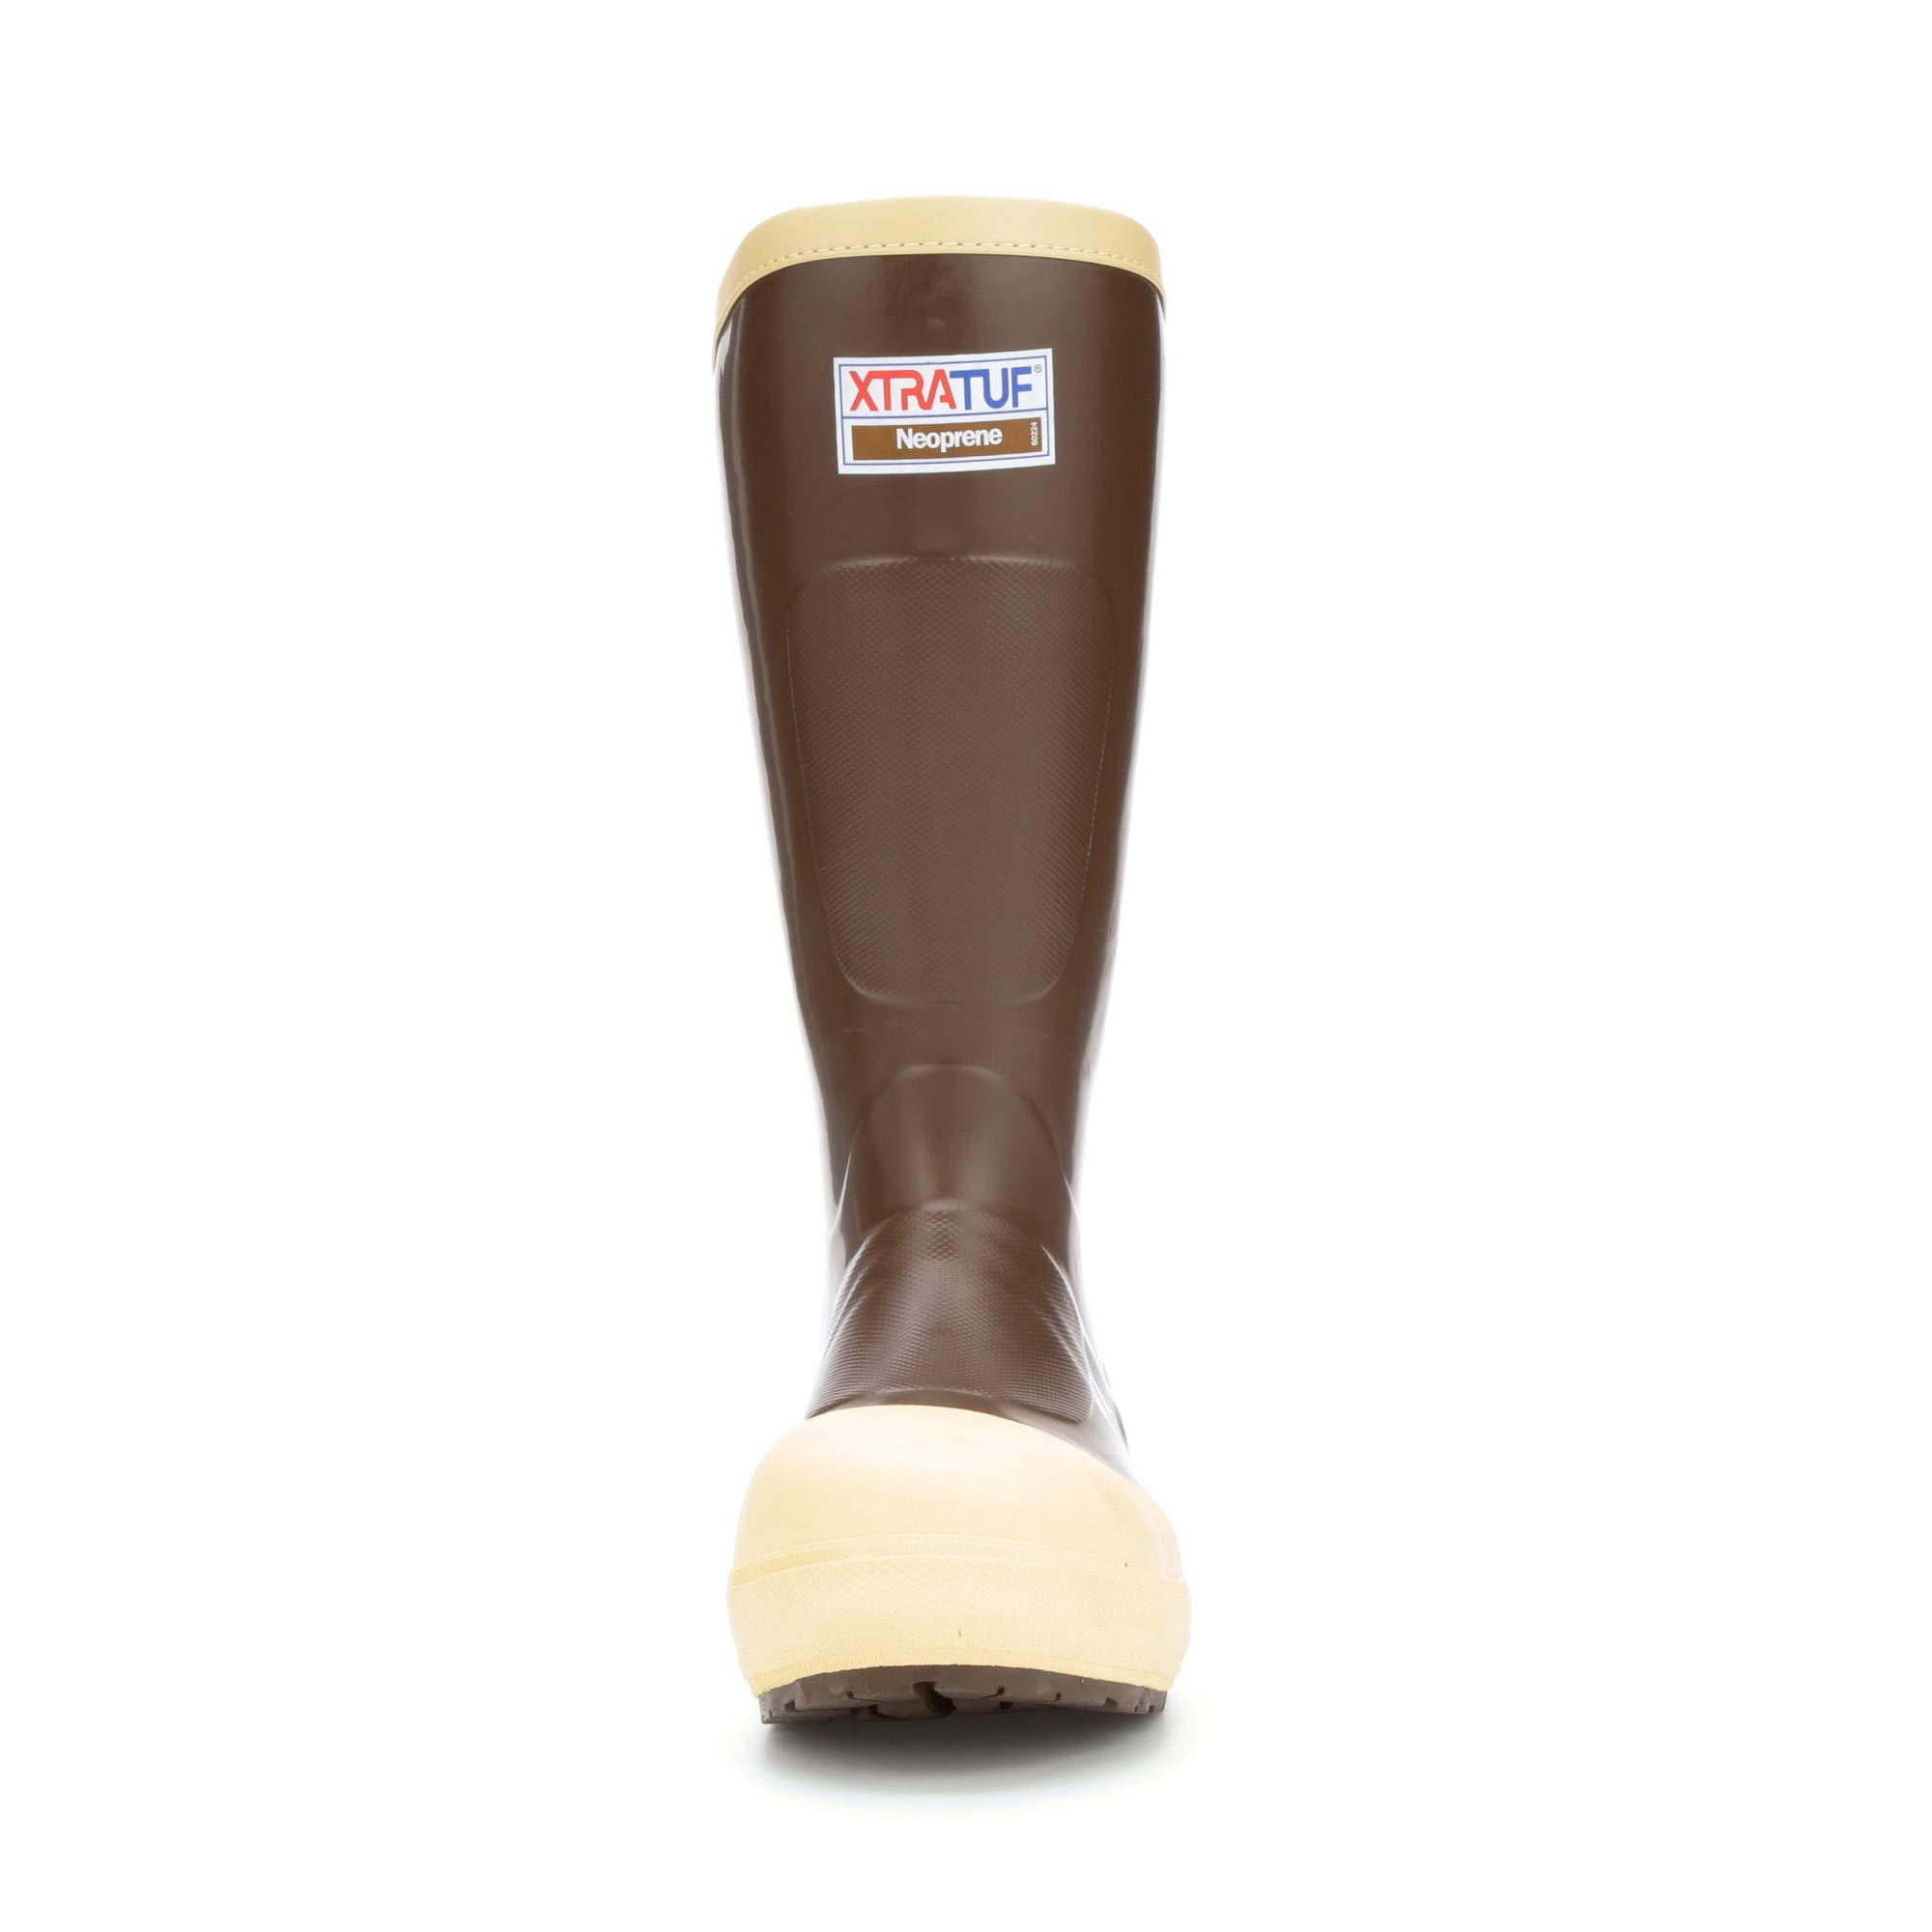 XTRATUF Legacy 2.0 Series 15'' Neoprene Composite Toe Men's Fishing Boots, Copper & Tan (22292G) by Xtratuf (Image #4)